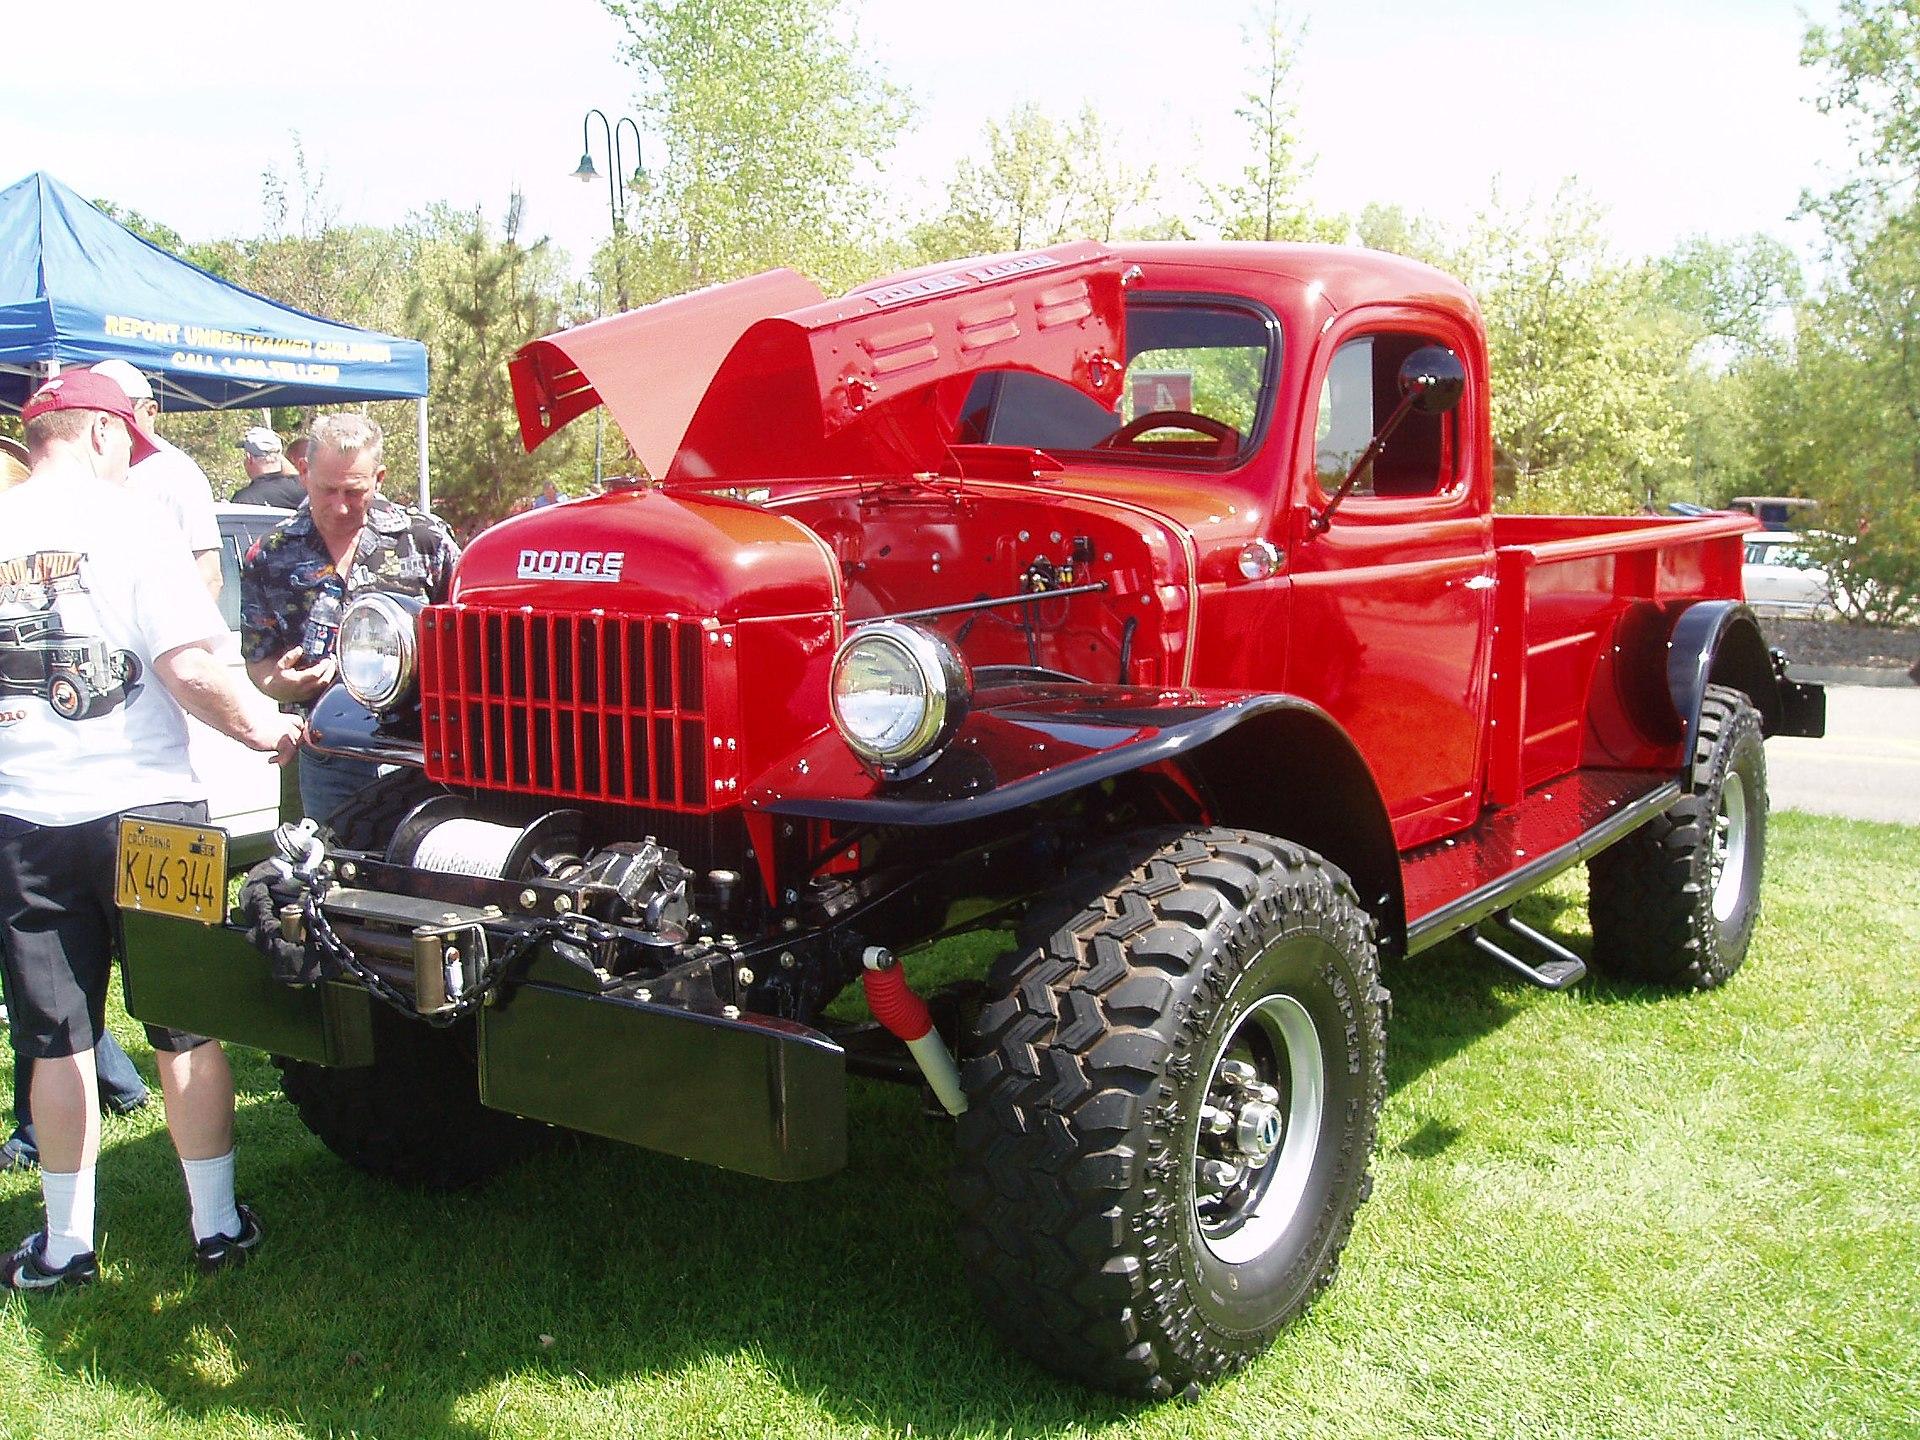 Dodge Power Wagon - Simple English Wikipedia, the free encyclopedia